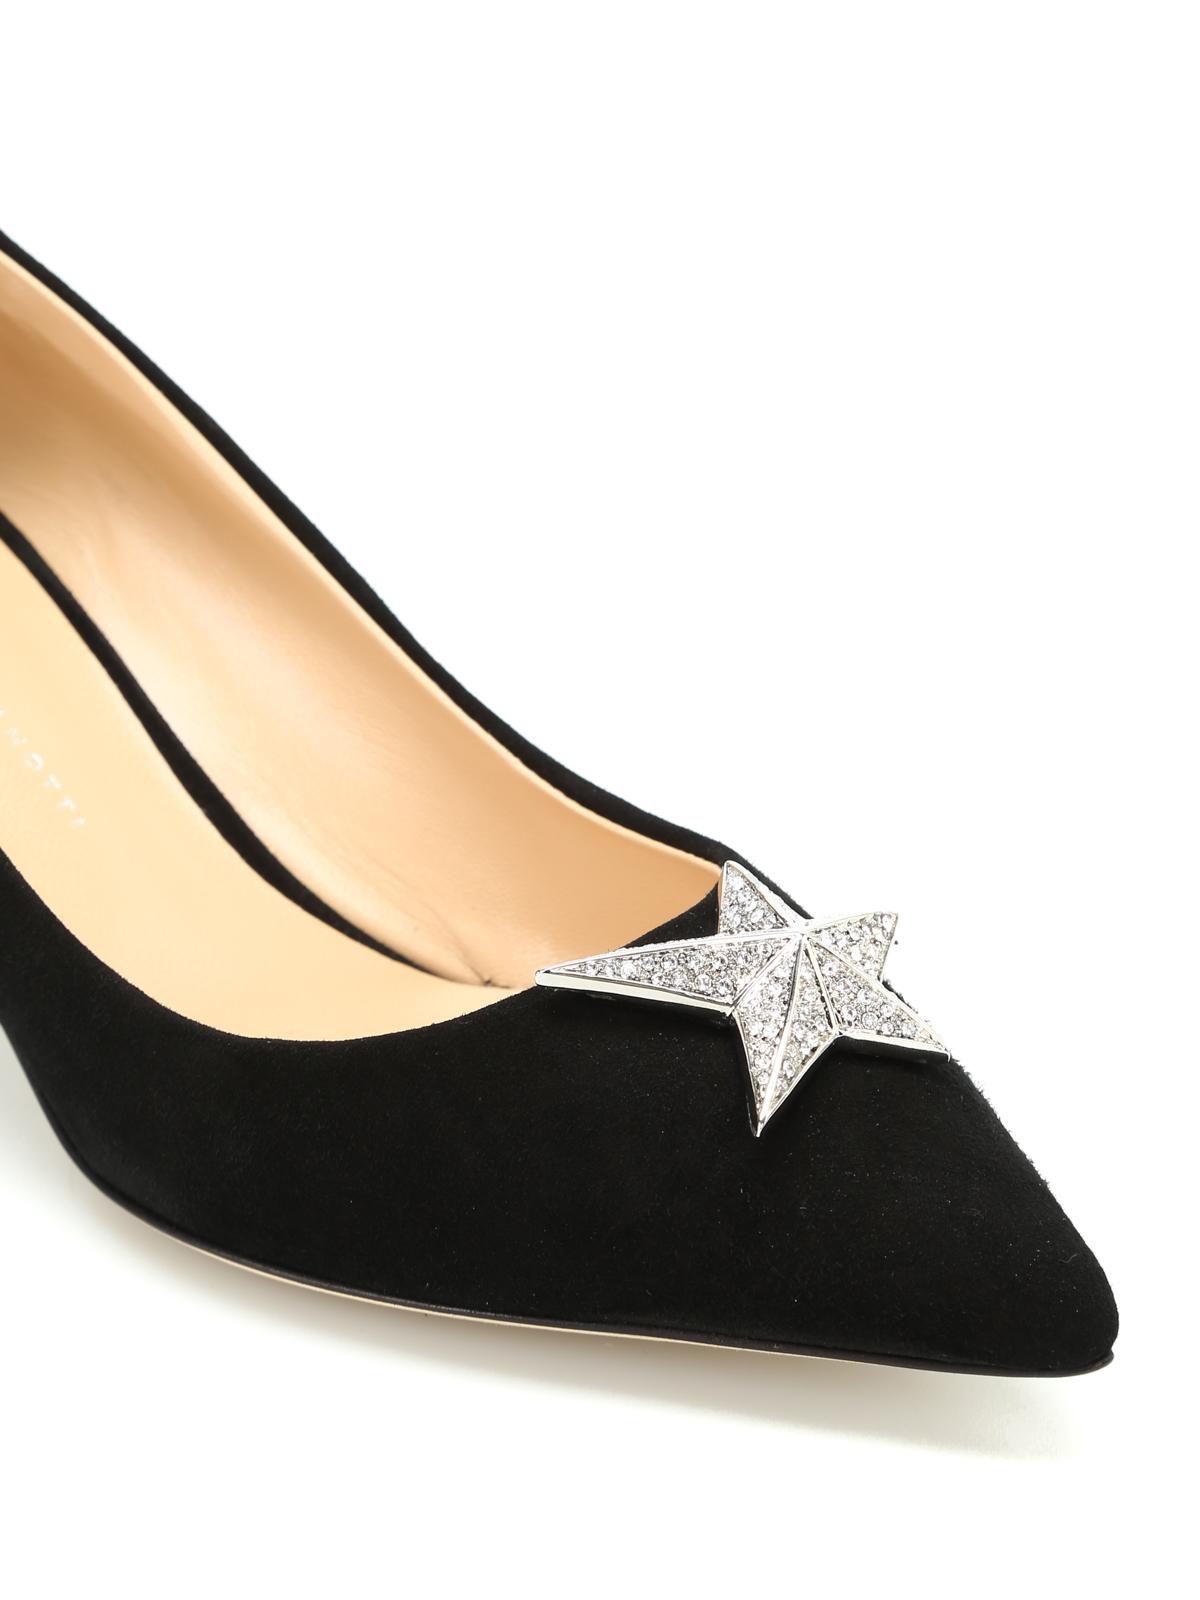 9c509972f05 Giuseppe Zanotti Shoes Sale Youtube Jeweled Flat Sandals For Women ...